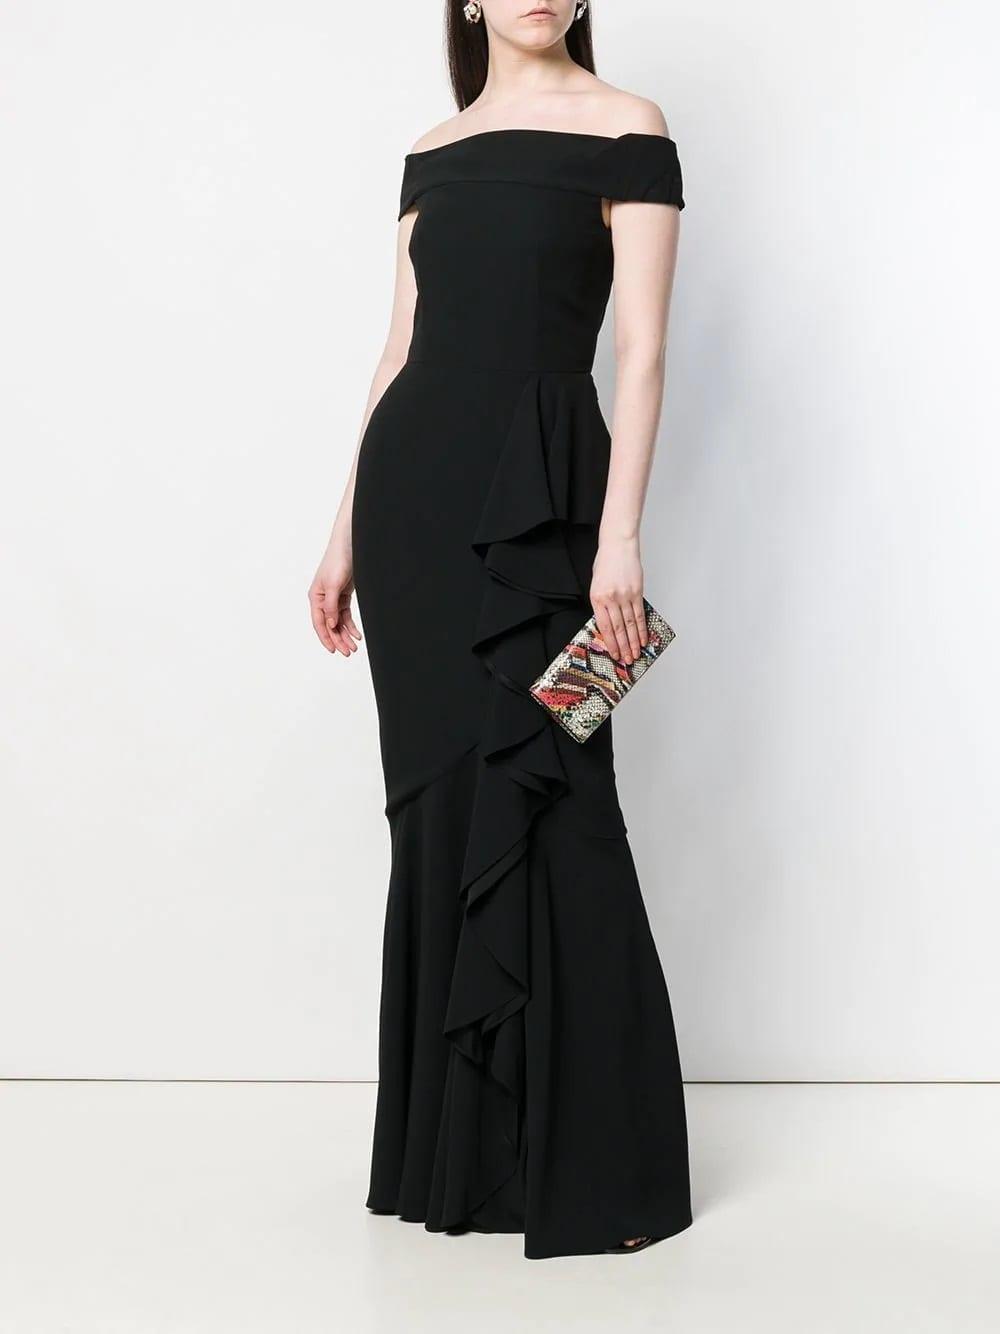 ALEXANDER MCQUEEN Off-the-shoulder Evening Black Dress